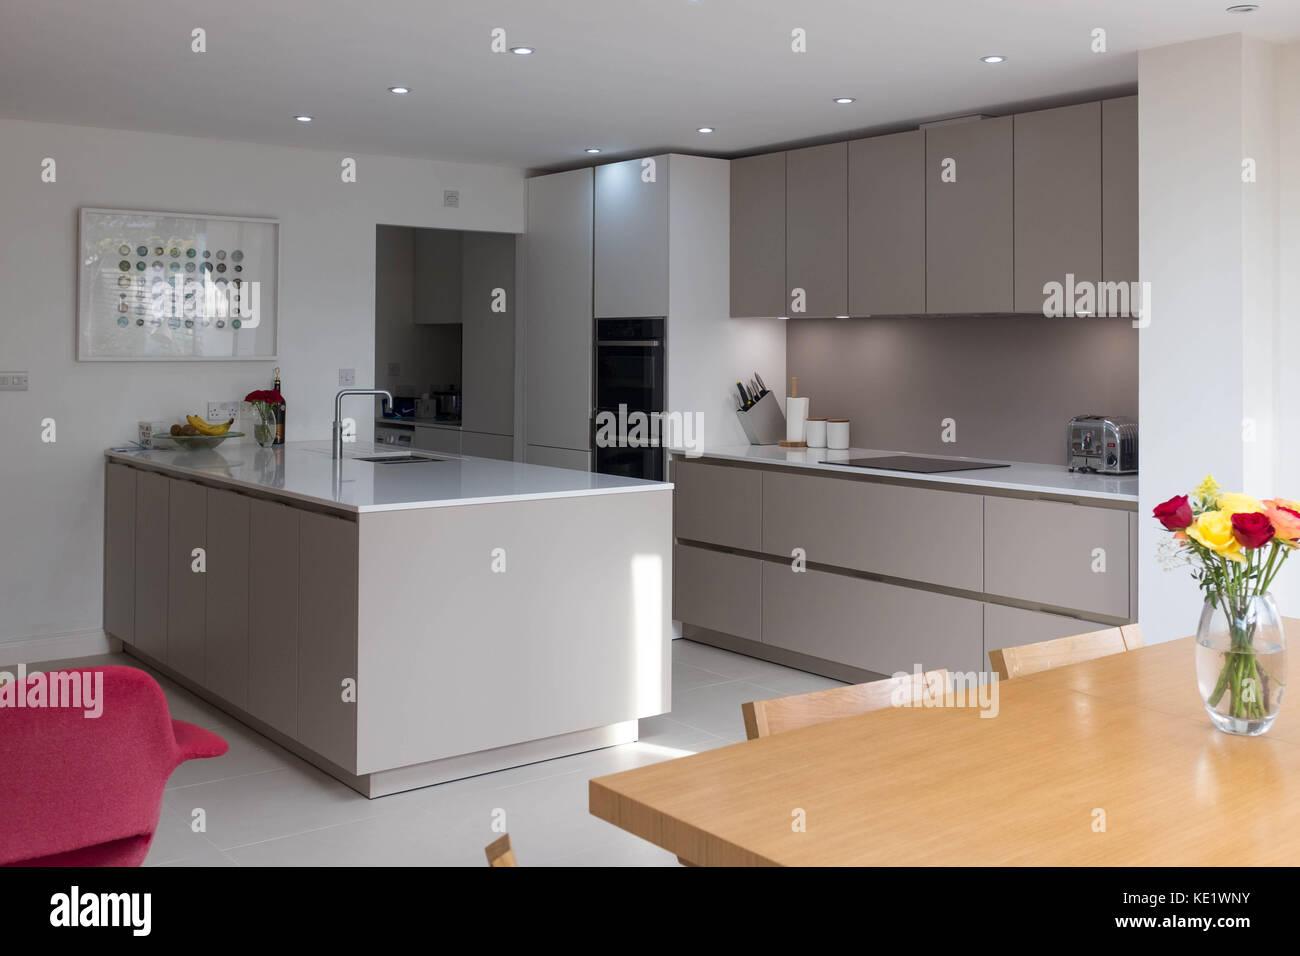 German Kitchen Stock Photos German Kitchen Stock Images Alamy